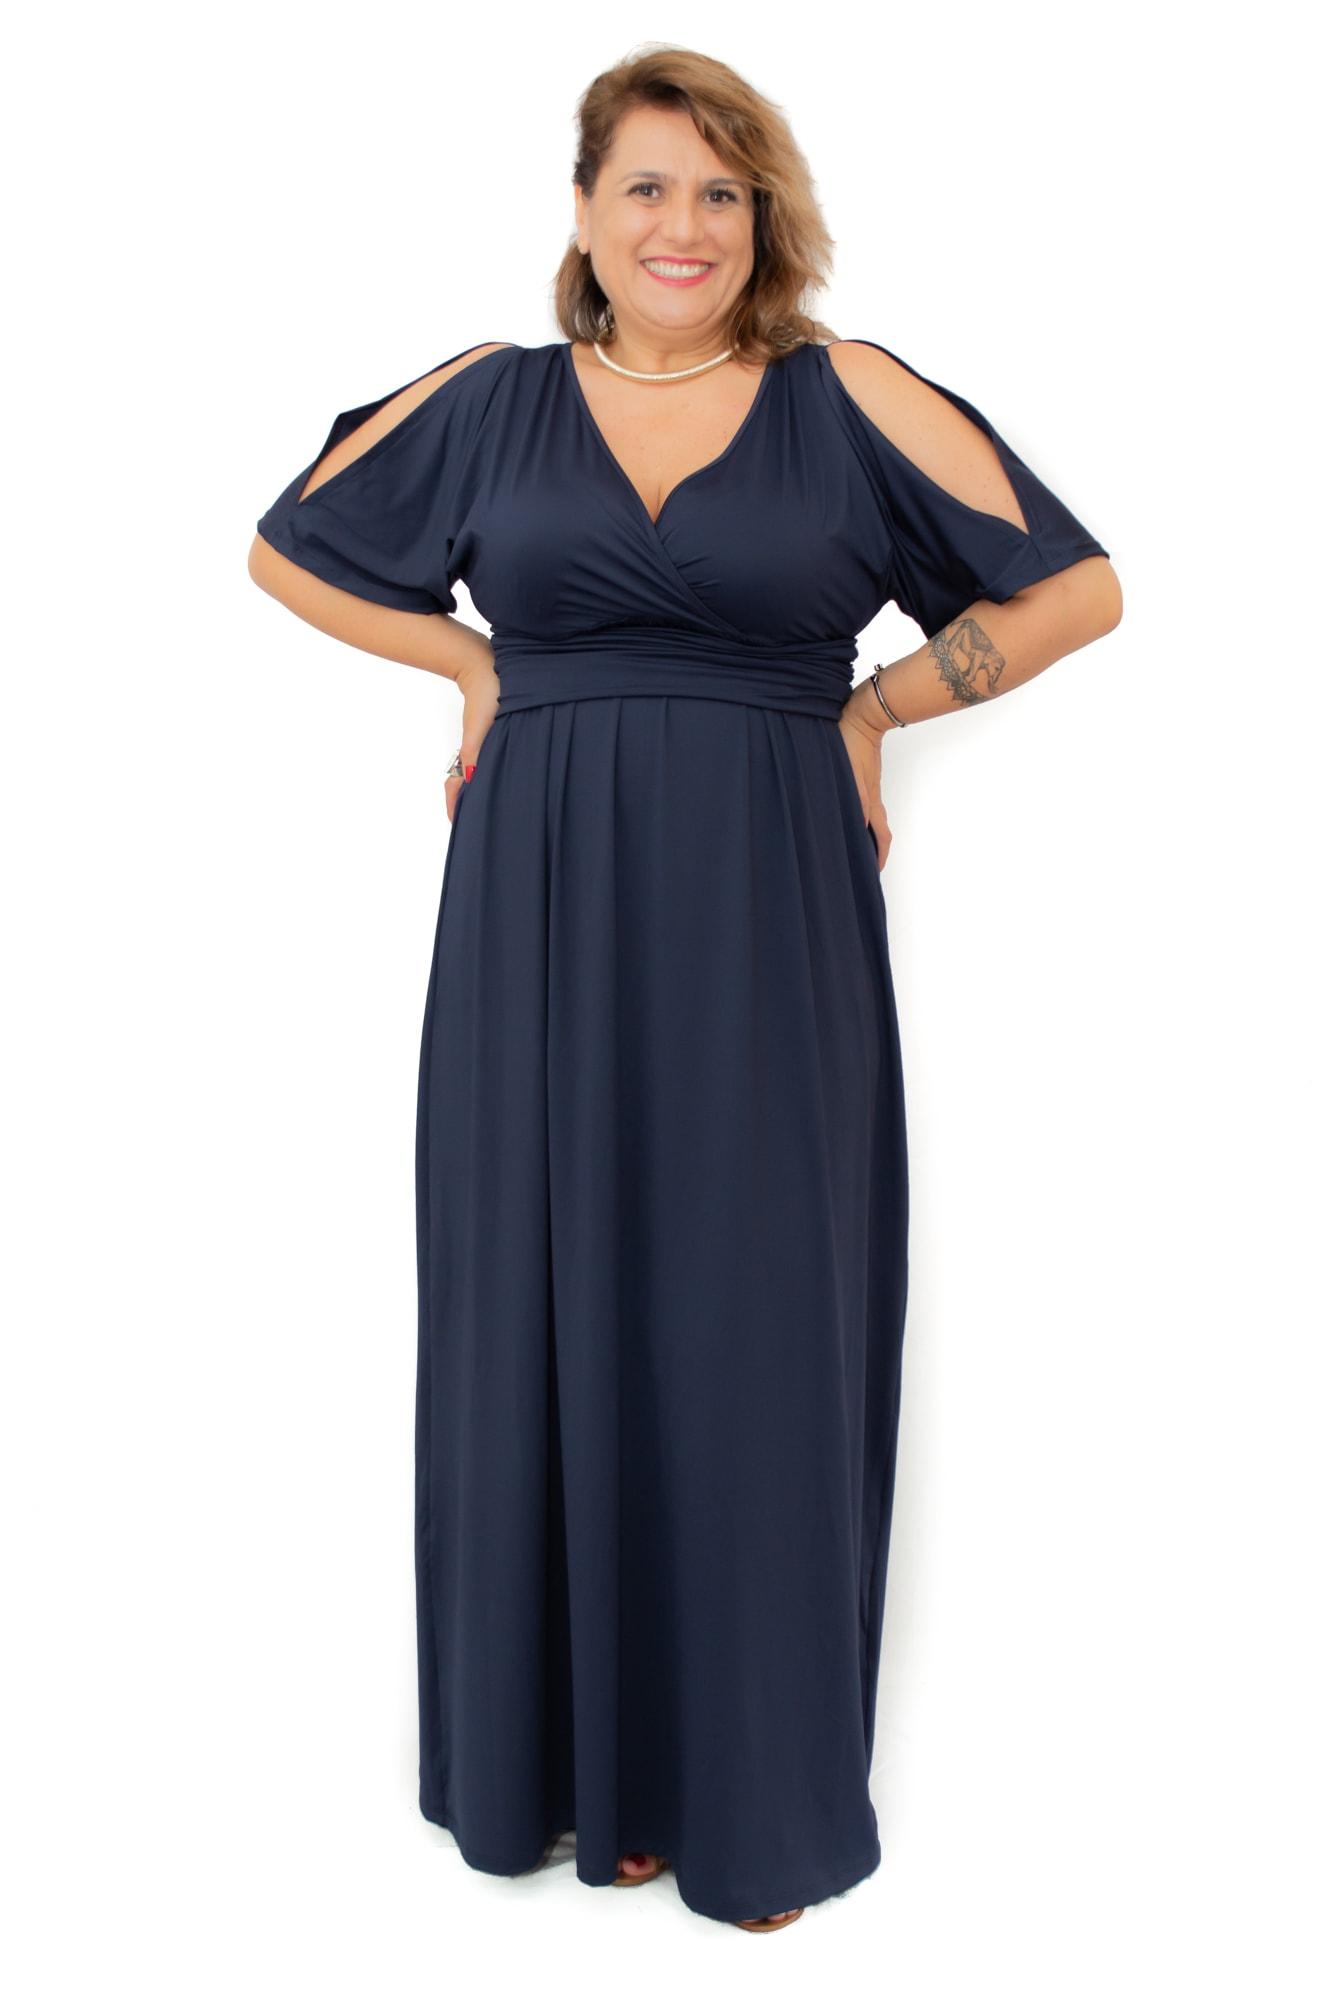 Vestido Longo Plus Size Azul Marinho